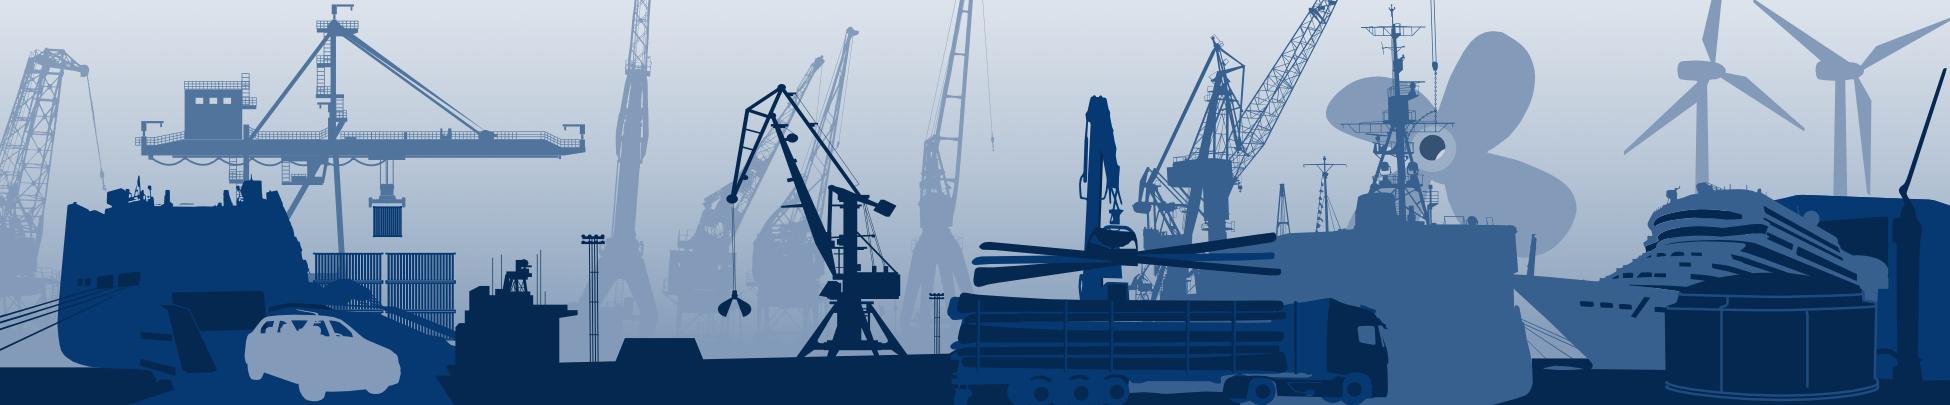 https://www.seaports.de/content/uploads/SEAPORTS-Teaser-Website-Startseite_03_1950x405.jpg